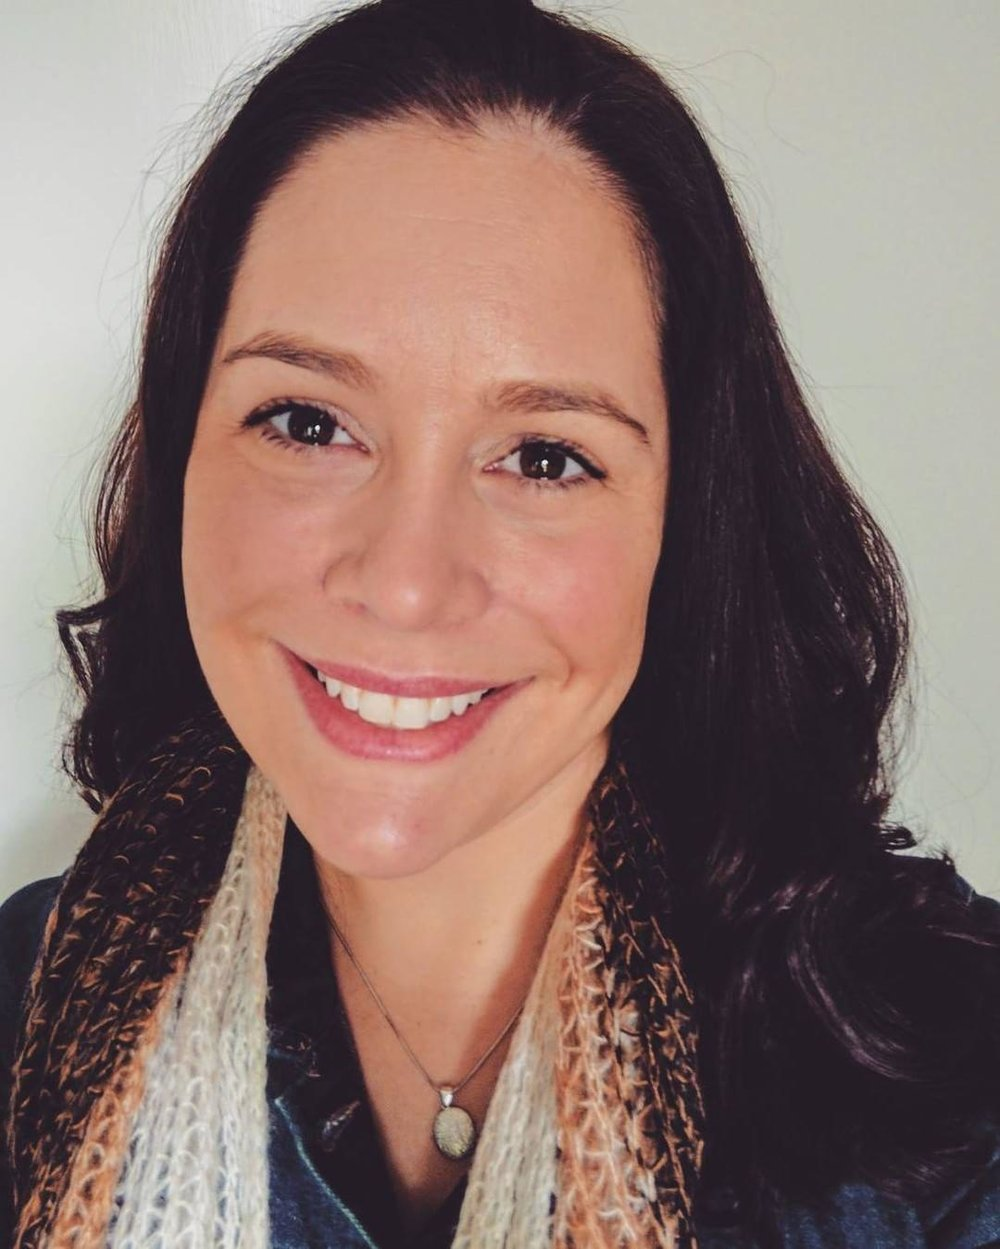 Megan Deras Gardner, MS, CNS, CPT